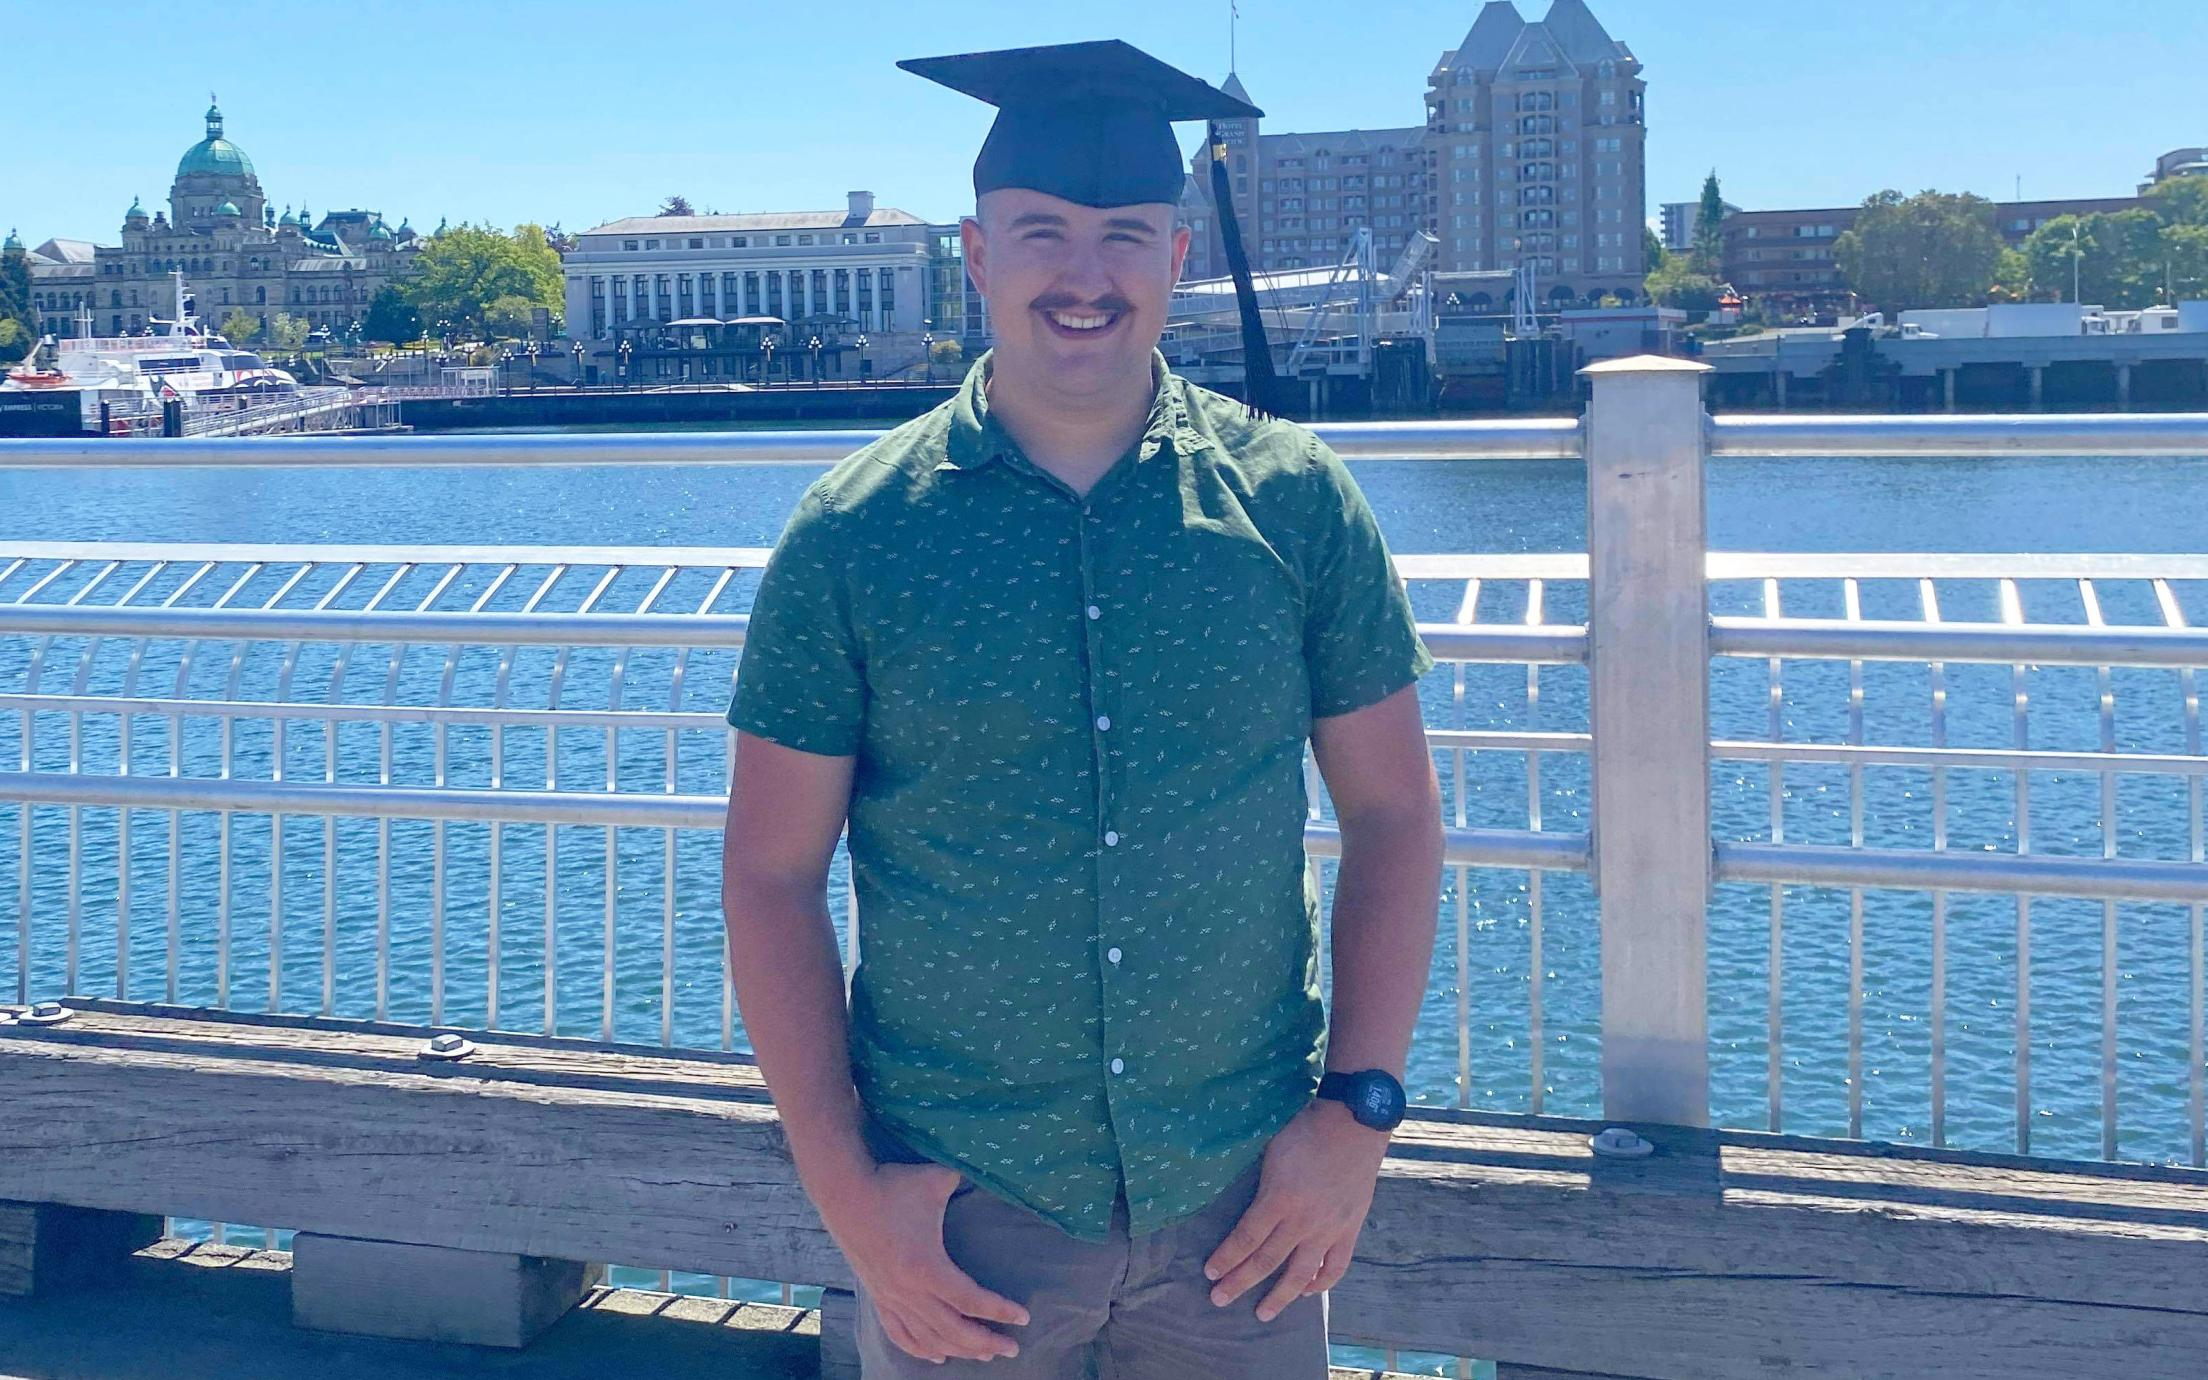 VIU Criminology grad Liam Kenney posing in his grad hat